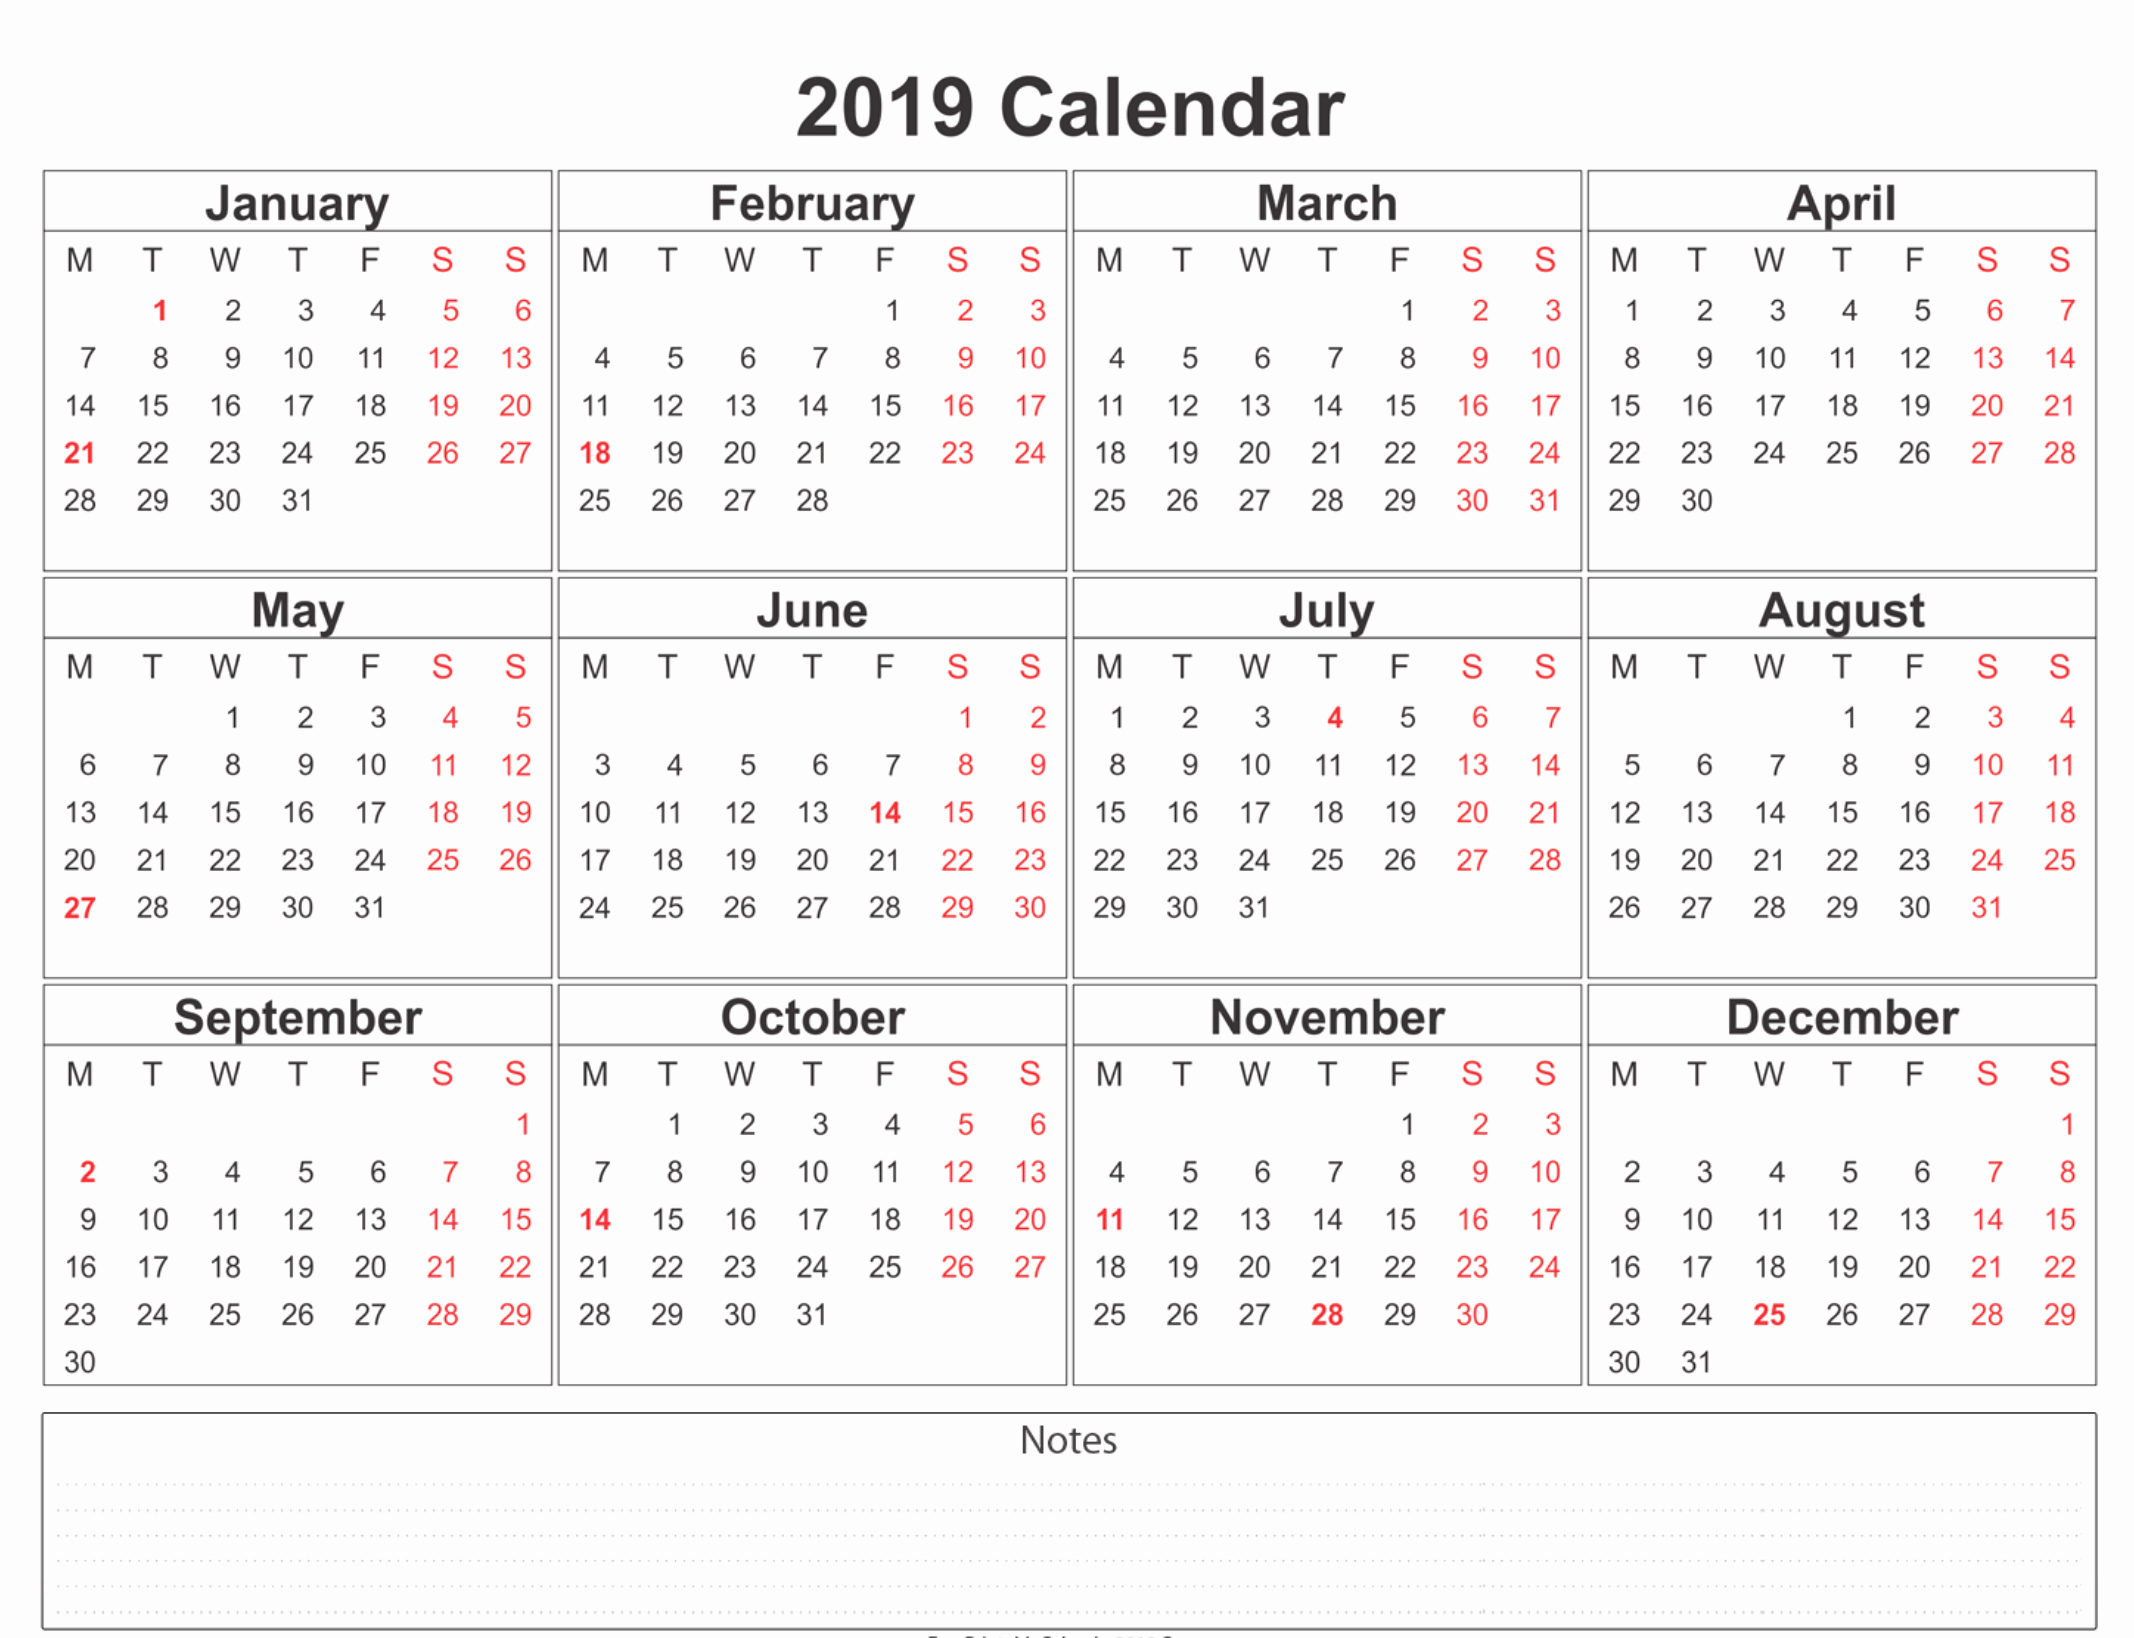 Free Printable 12 Month Calendar Lovely 2019 Calendar Amazonaws